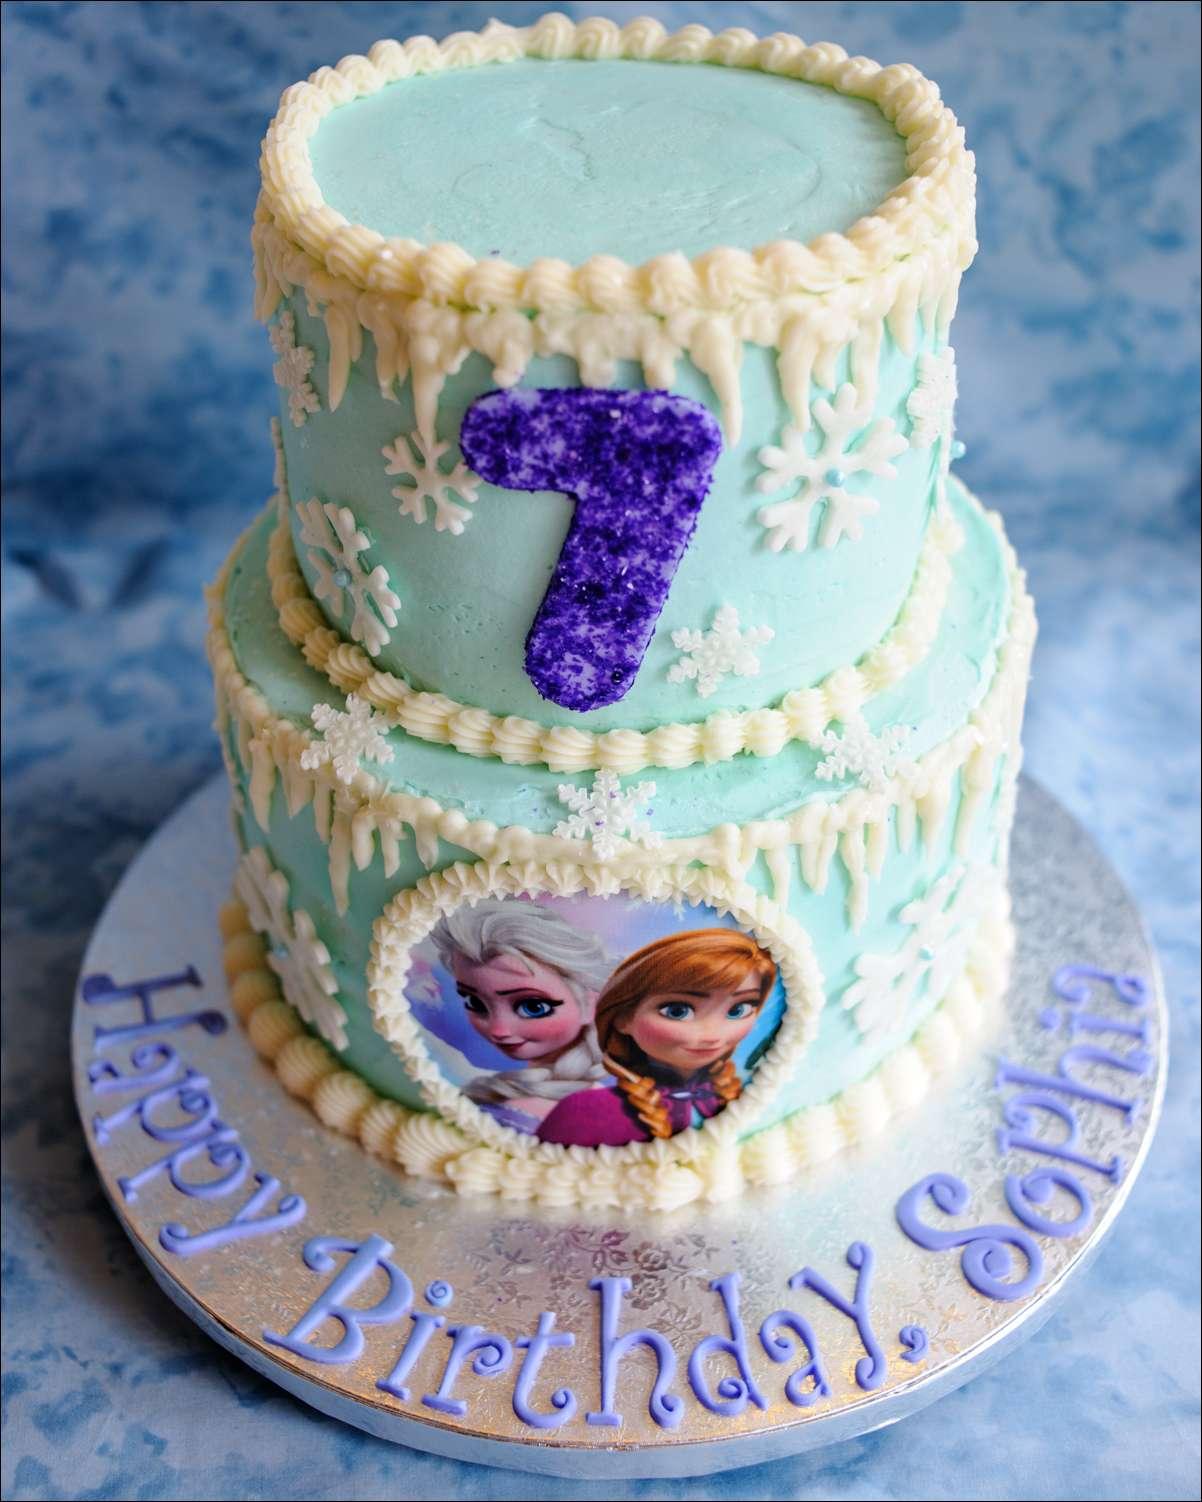 frozenbirthdaycakecupcakecookies5 Gray Barn Baking